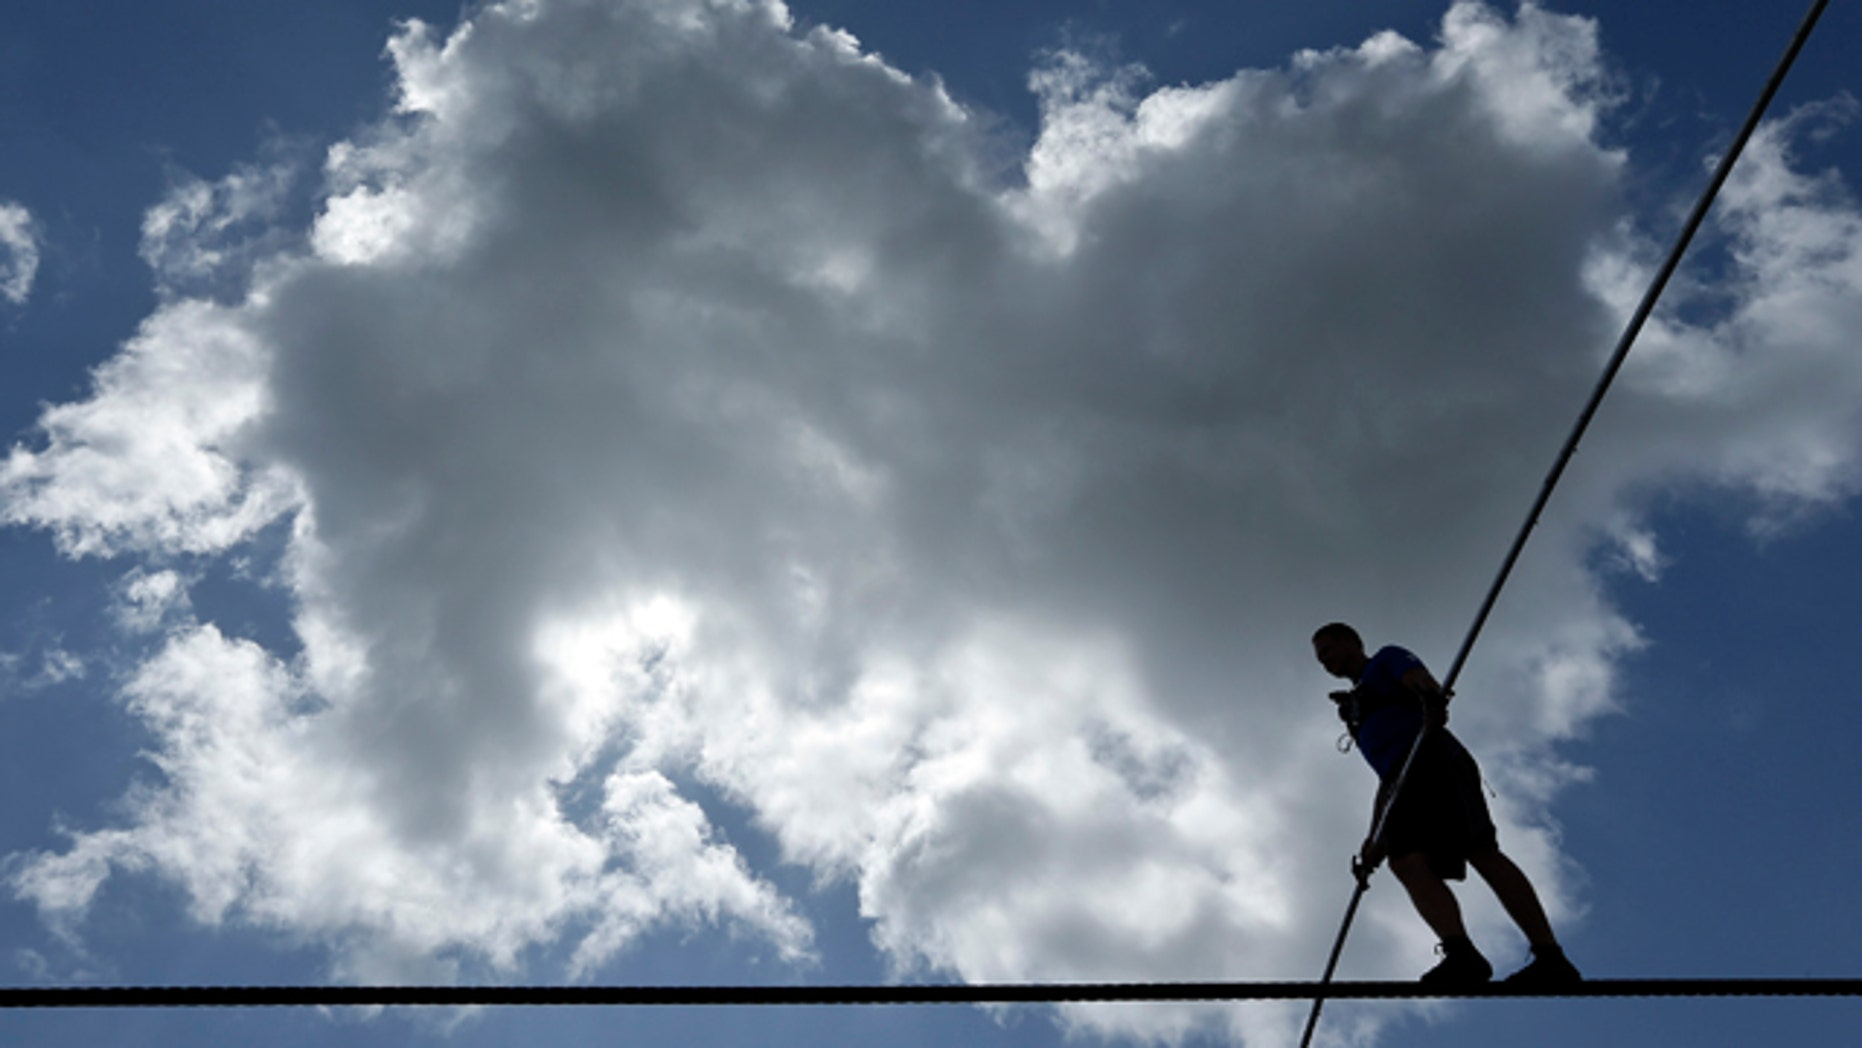 June 18, 2013: High wire performer Nik Wallenda walks across a wire as he practices in Florida.